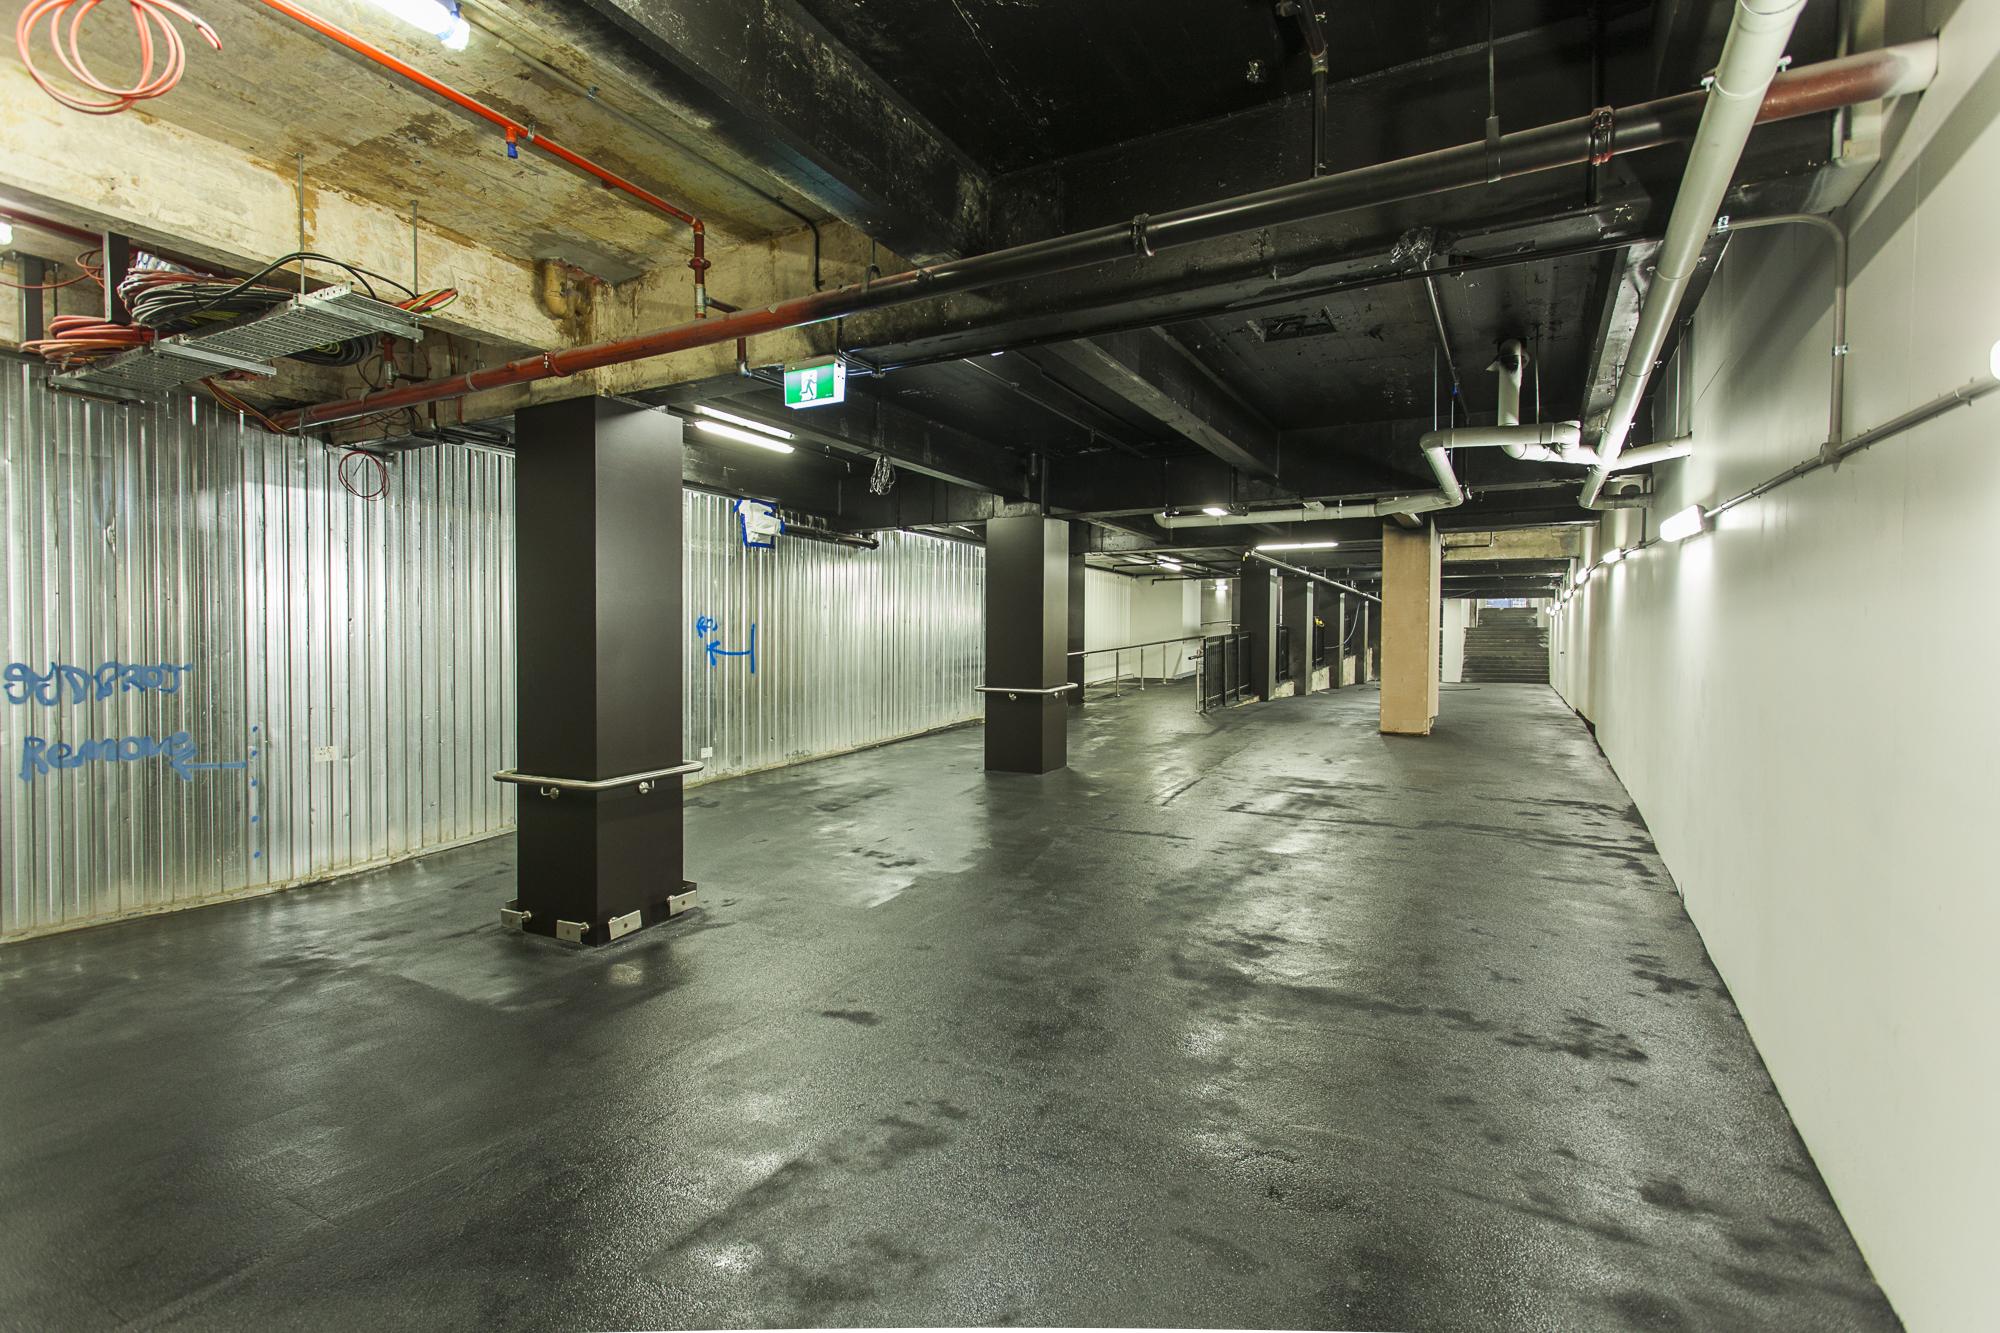 Concourse Pedestrian Access progress